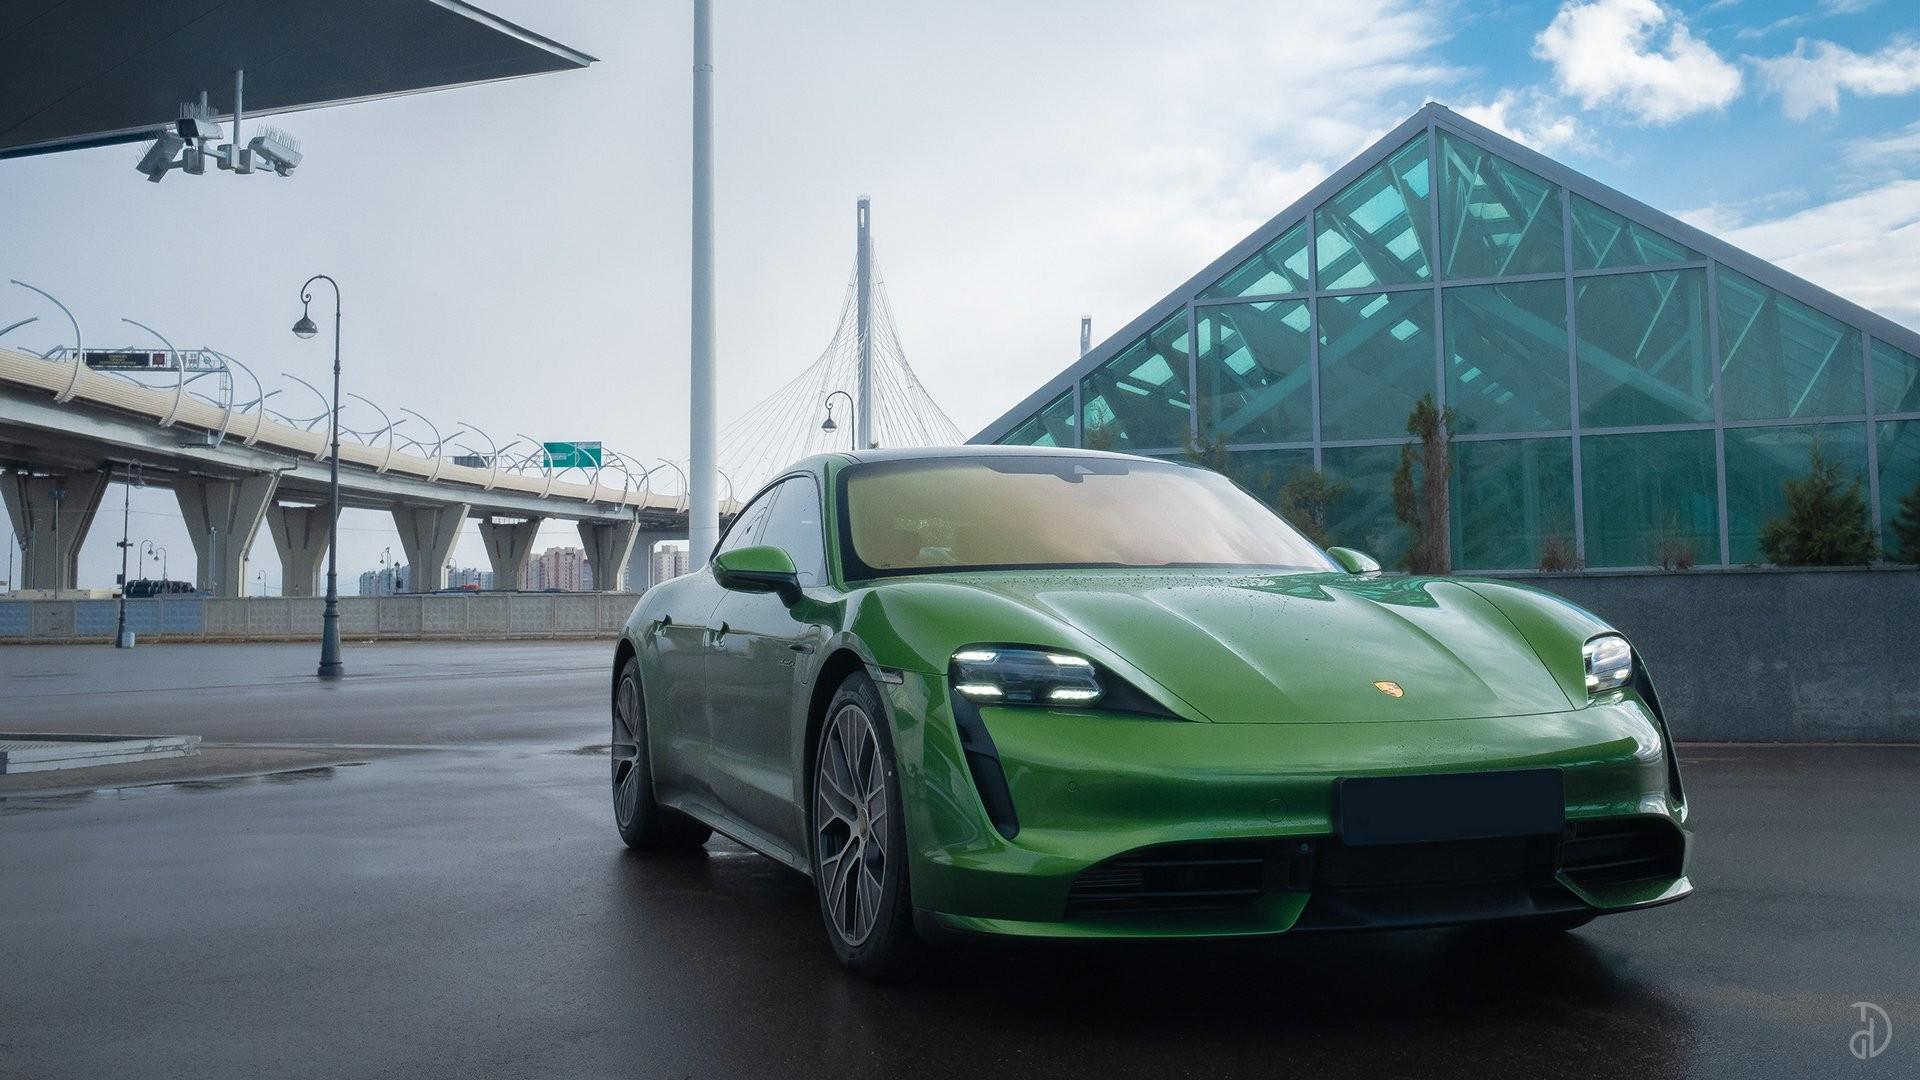 Аренда Porsche Taycan Turbo в Сочи. Фото 1